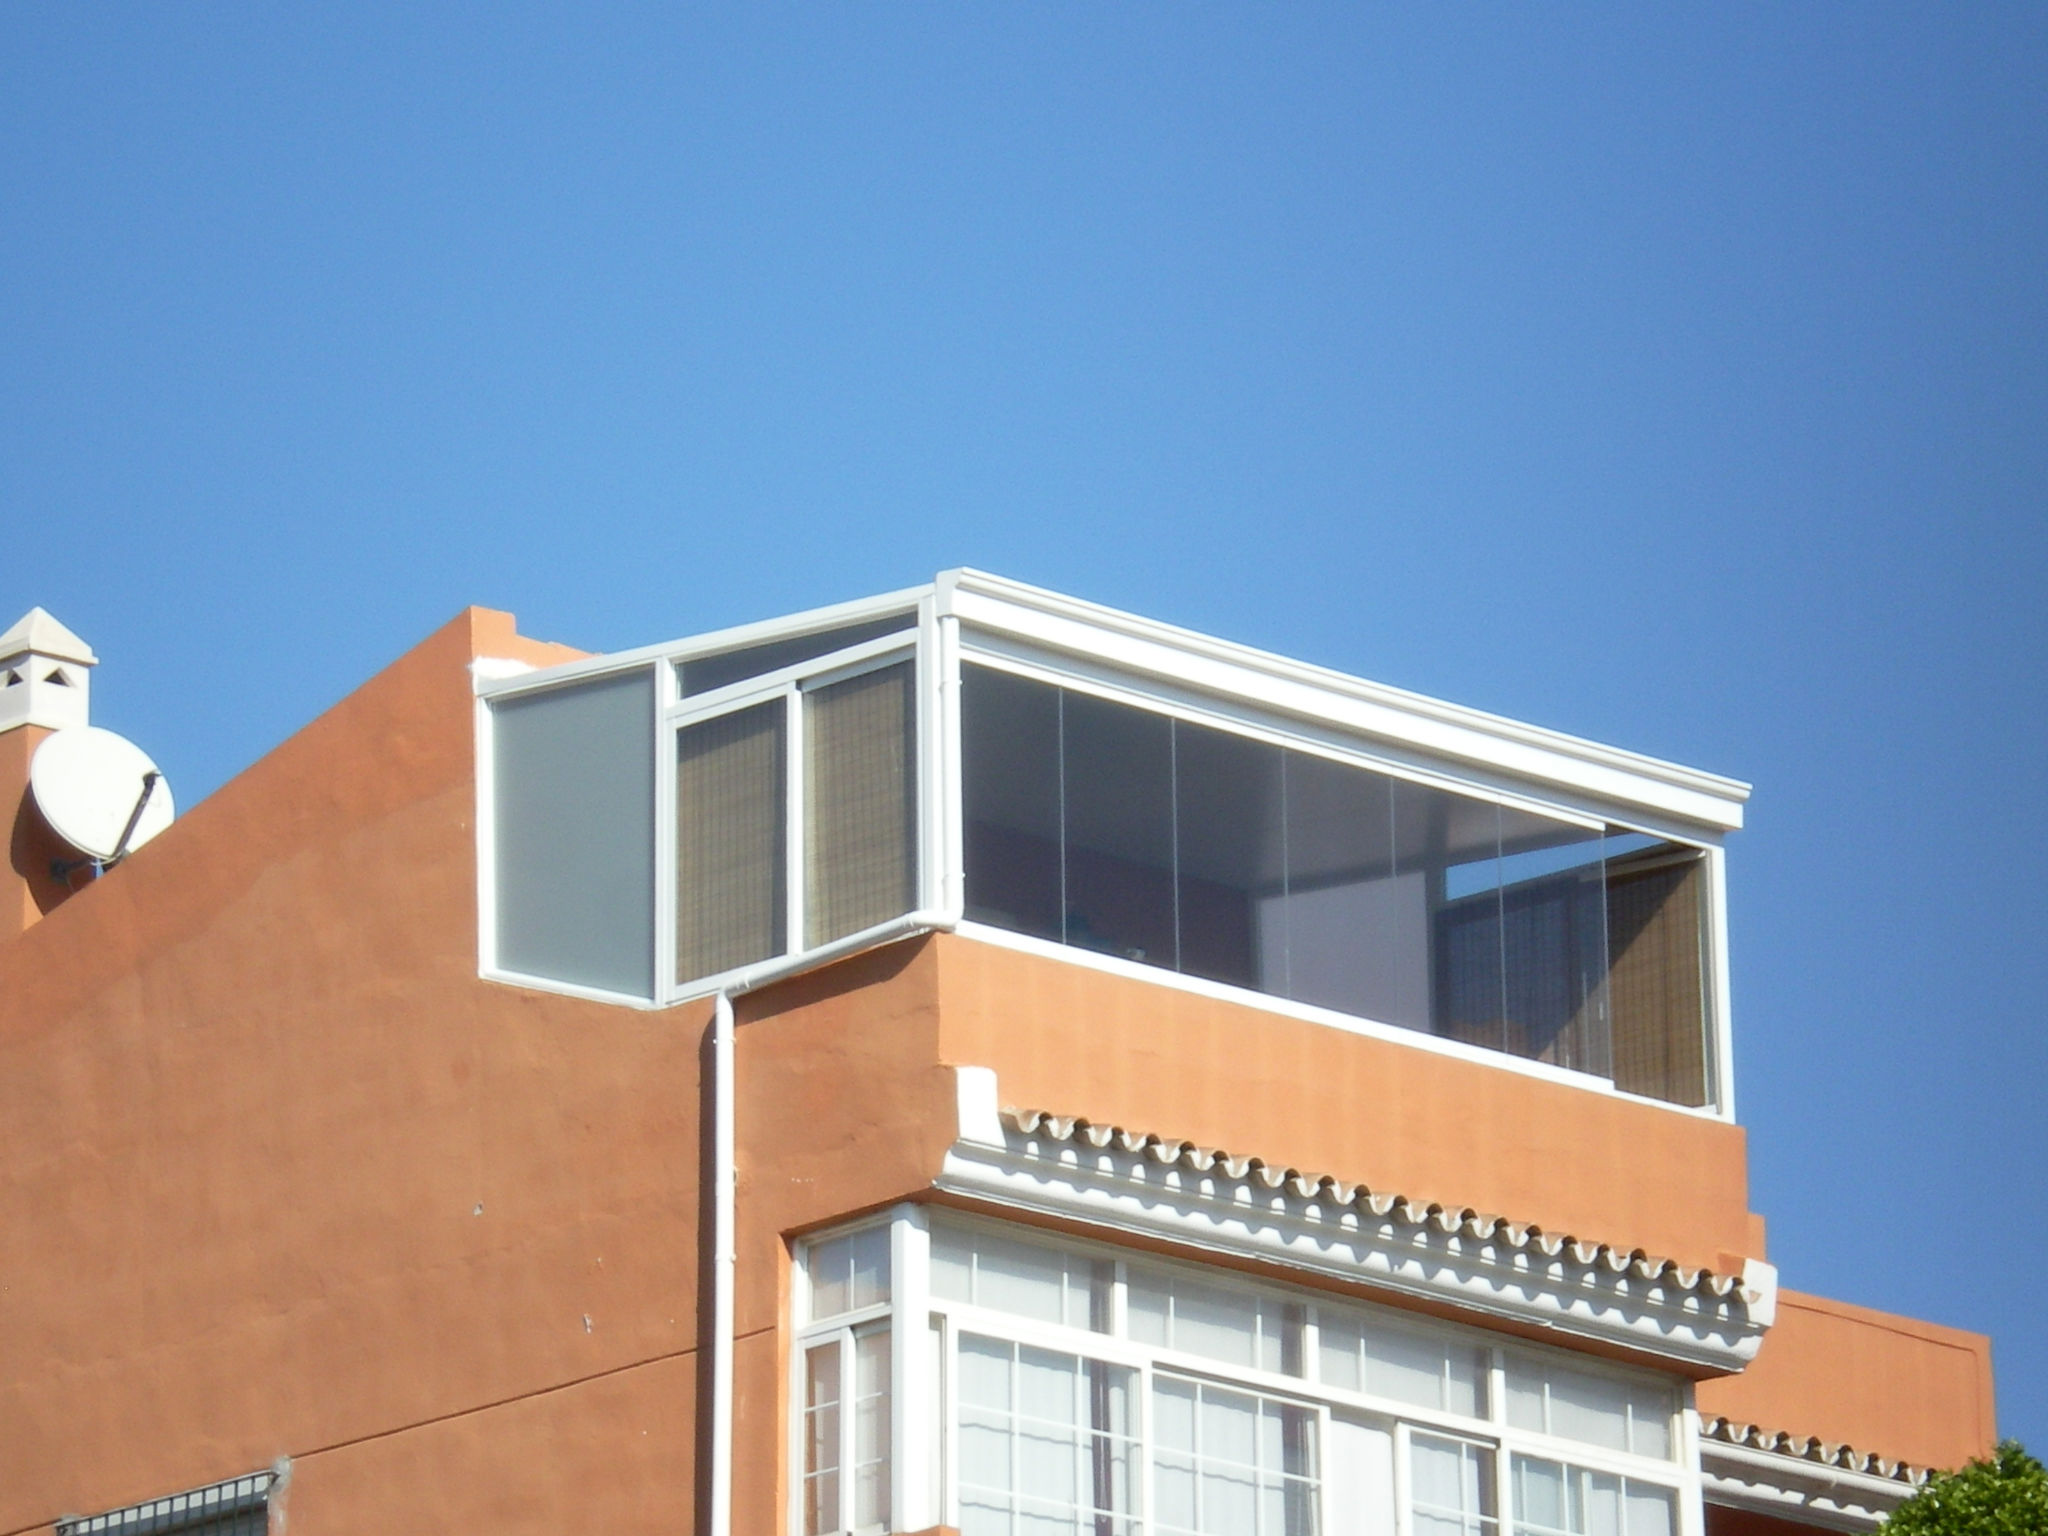 Foto 25 de Carpintería de aluminio, metálica y PVC en Málaga | Aluminios Alunoe